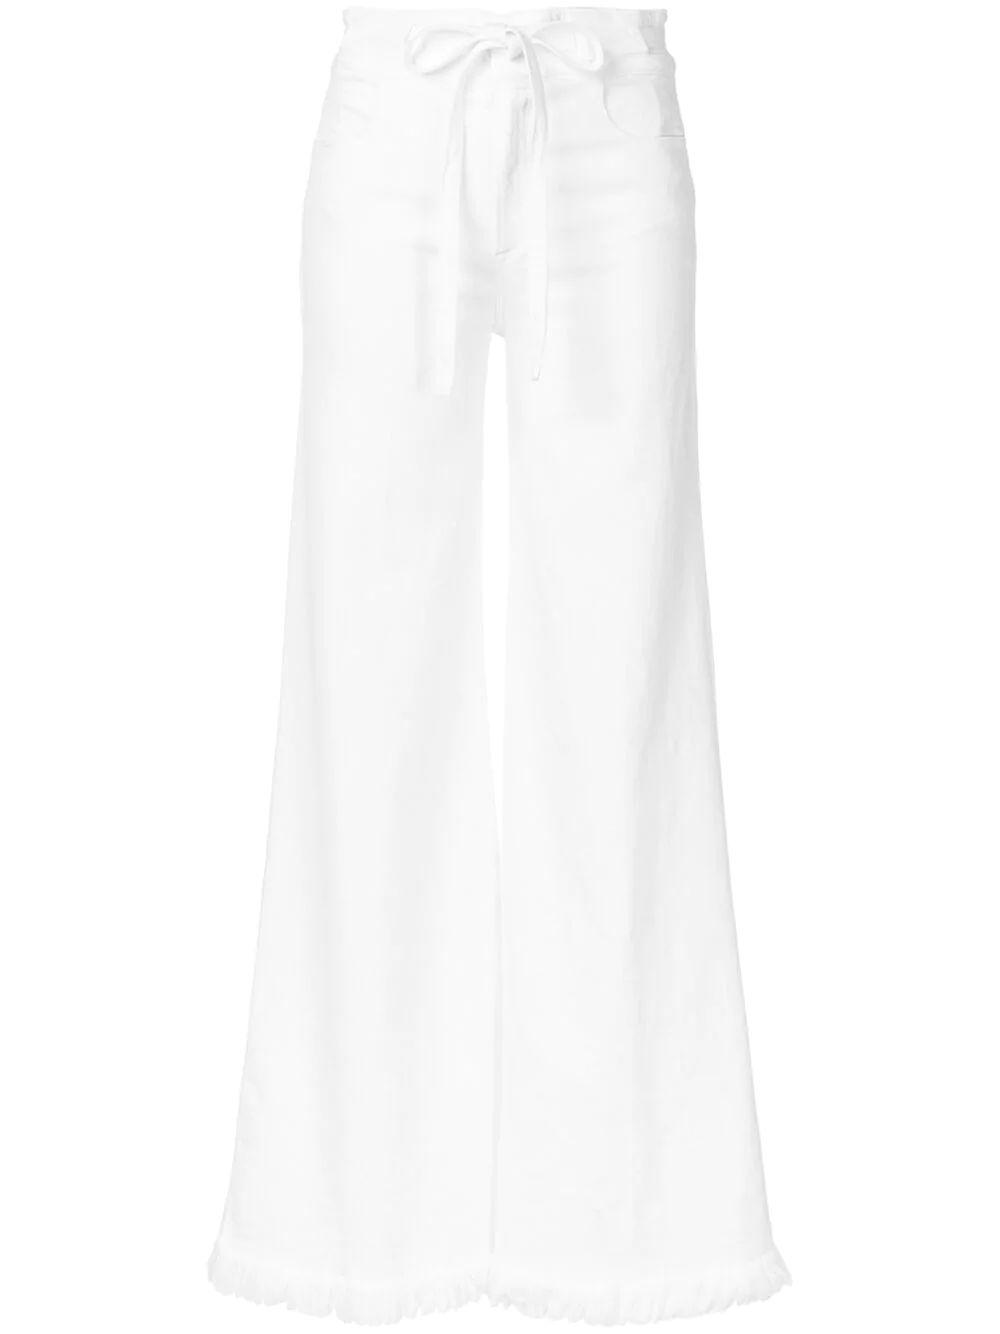 LPPBRE711 WHITE